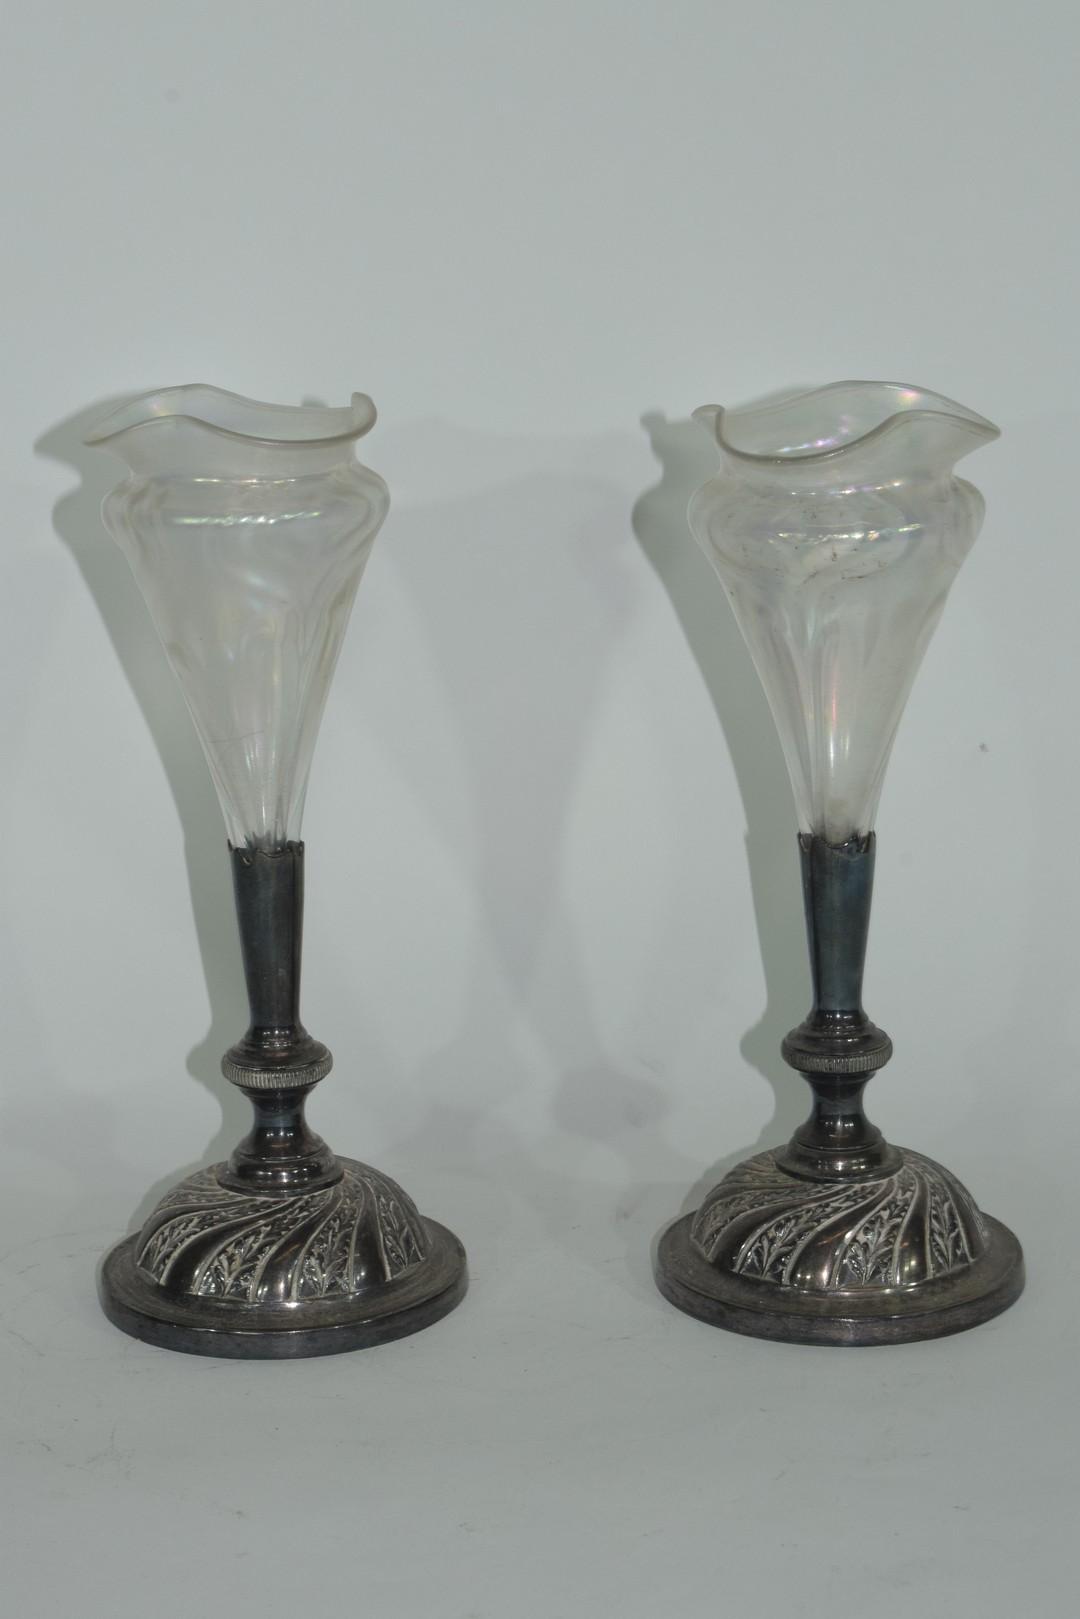 Pair of Art Nouveau bud vases - Image 4 of 5